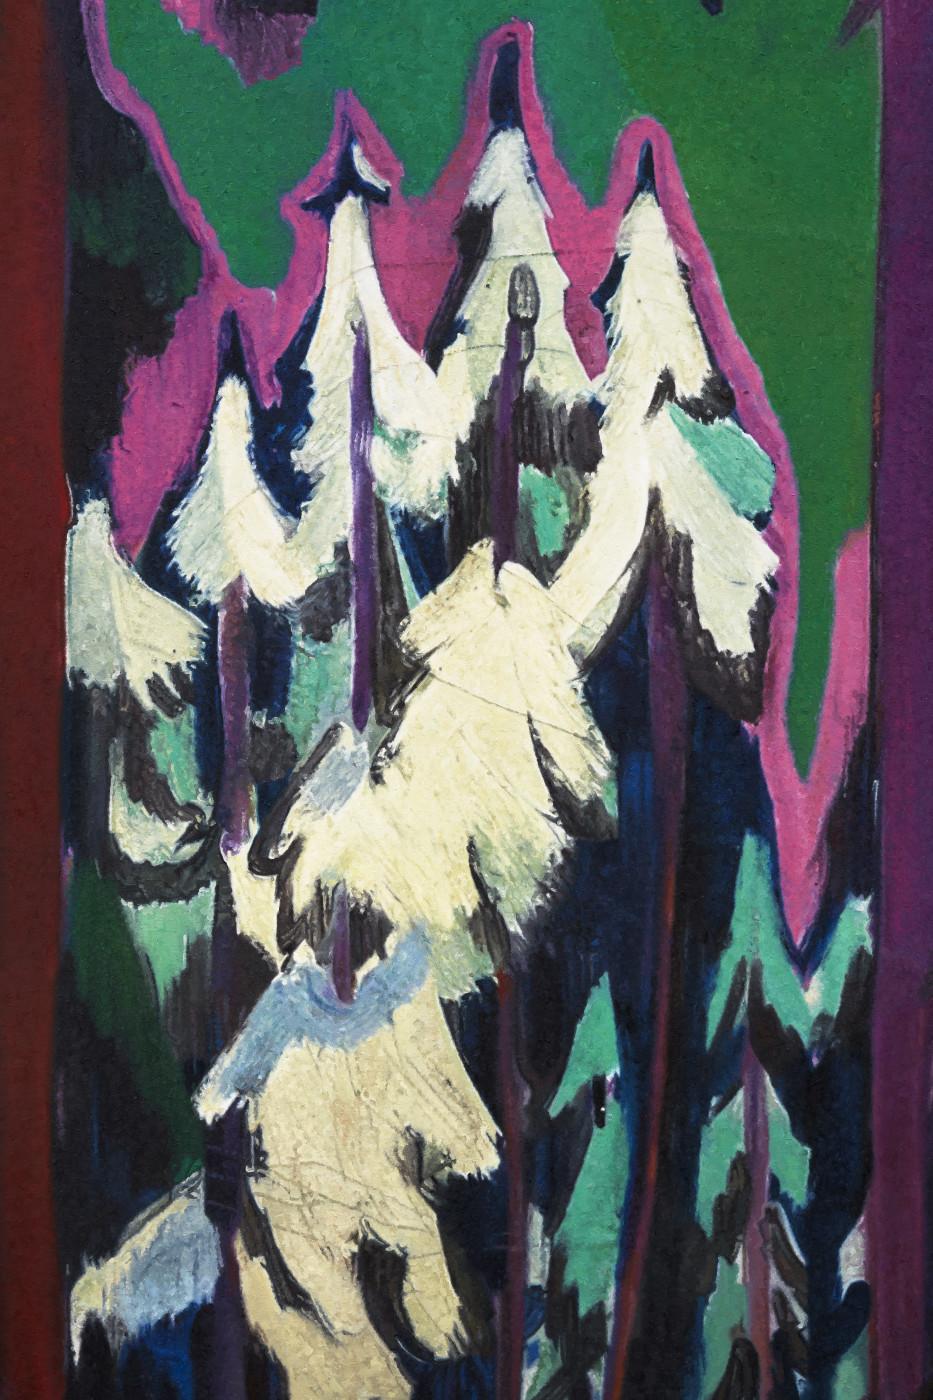 "<div class=""artwork_caption""><div class=""title""><i>Kirchner Wald im Winter 1925,</i>2019</div><div class=""medium"">oil on canvas</div><div class=""dimensions"">242.3 x 203 x 5.8 cm / 95 3/8 x 79 7/8 x 2 1/4 in</div></div><div class=""link""><span class=""website_contact_form"" data-contact-form-details=""Kirchner Wald im Winter 1925, 2019  oil on canvas  242.3 x 203 x 5.8 cm / 95 3/8 x 79 7/8 x 2 1/4 in"" data-contact-form-image=""https://artlogic-res.cloudinary.com/w_200,h_200,c_fill,f_auto,fl_lossy/ws-sadiecoles/usr/exhibitions/images/exhibitions/854/hq24-rs17209p_wald_im_winter_5.jpg"">Enquire</span></div>"